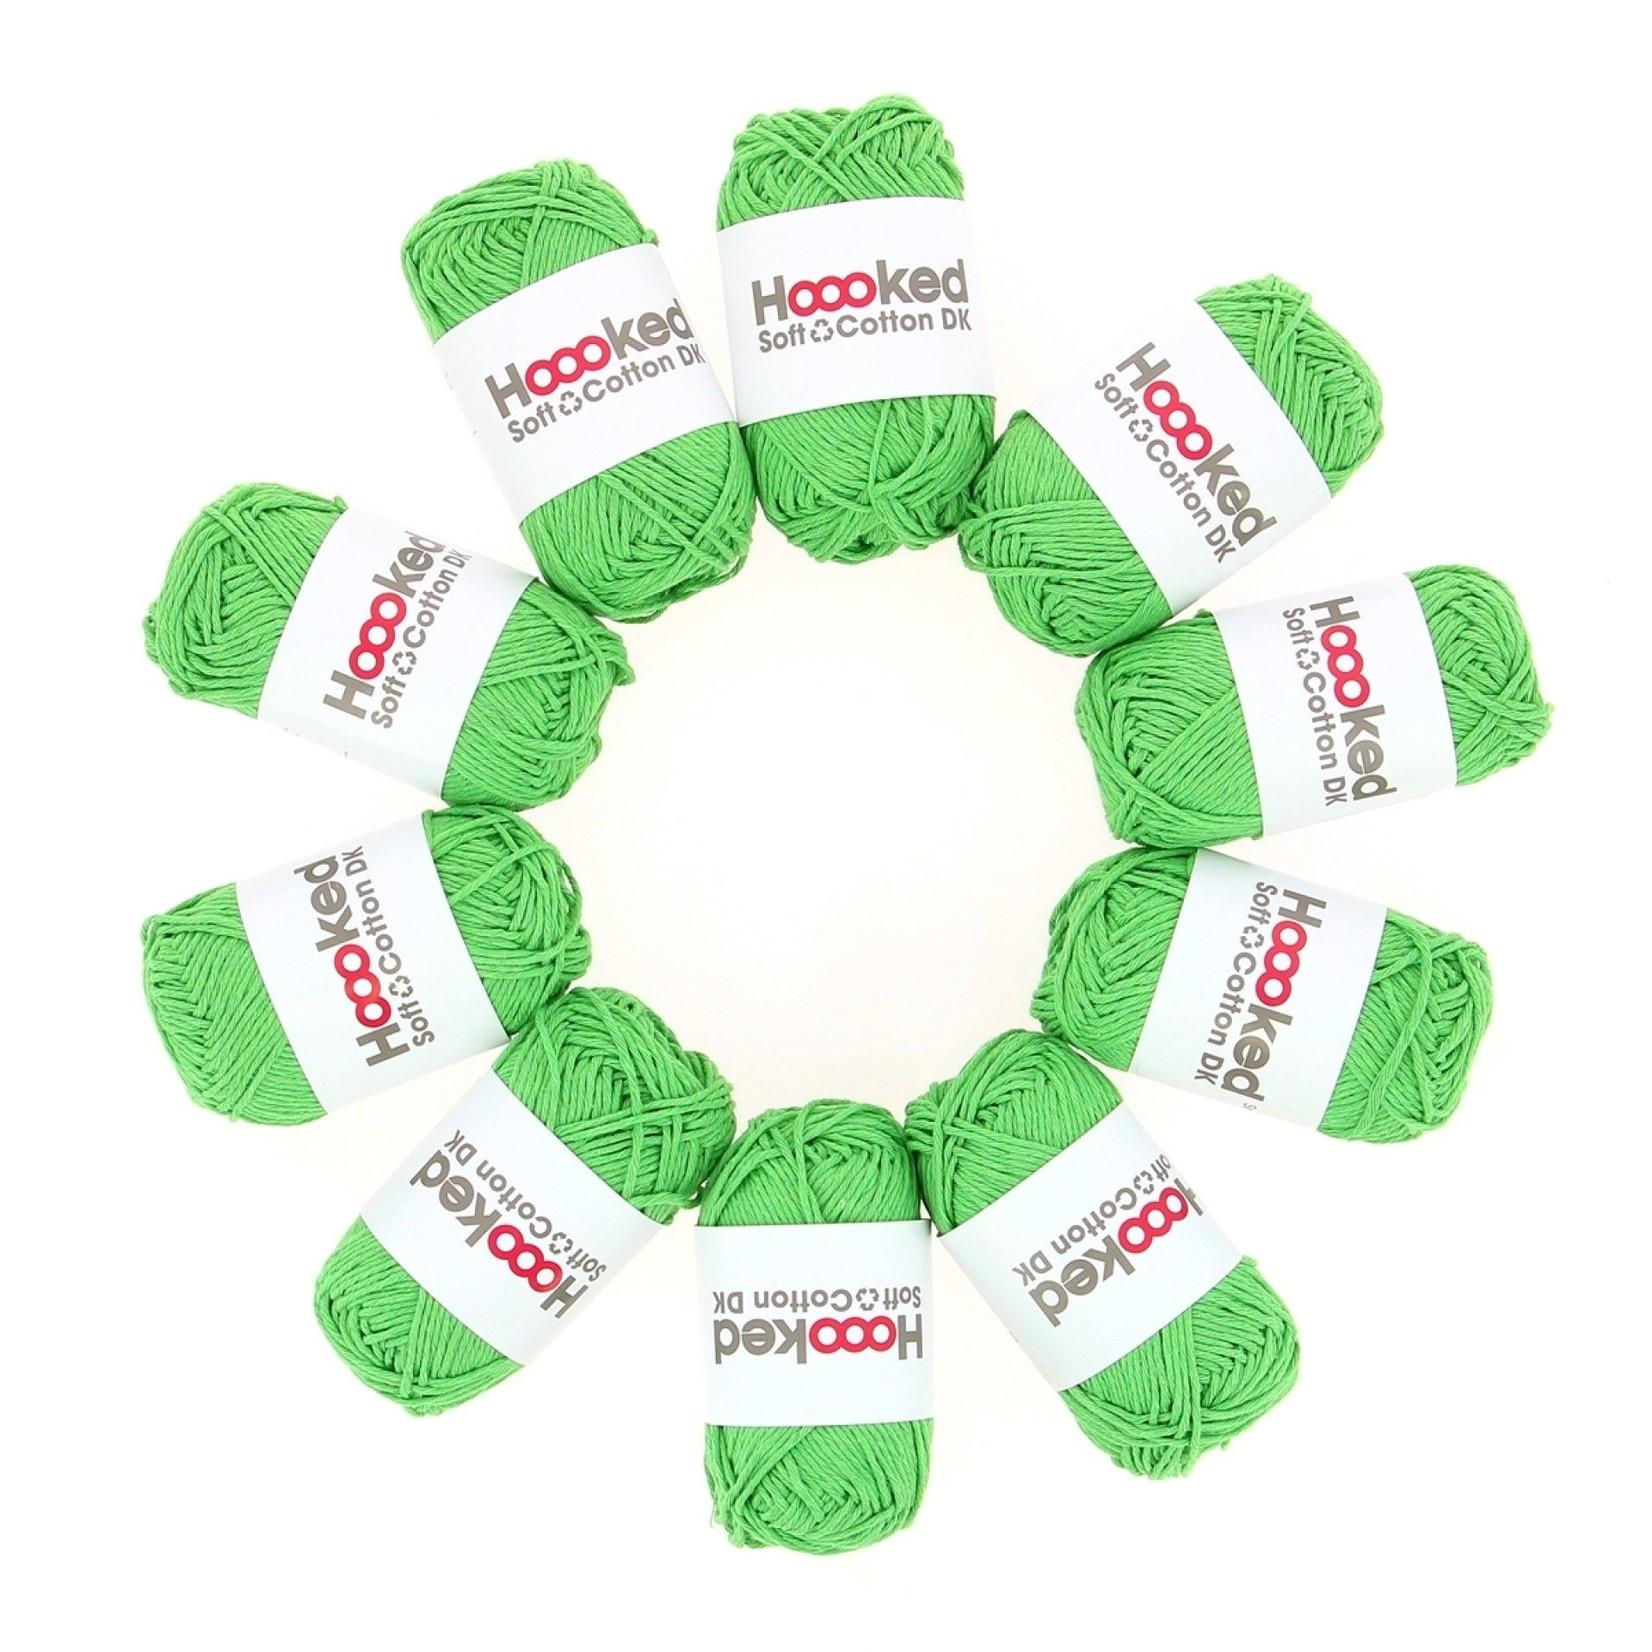 Hoooked Hoooked Soft Cotton DK Singapore Green bundel 5 x 50 gr. / 85 m.